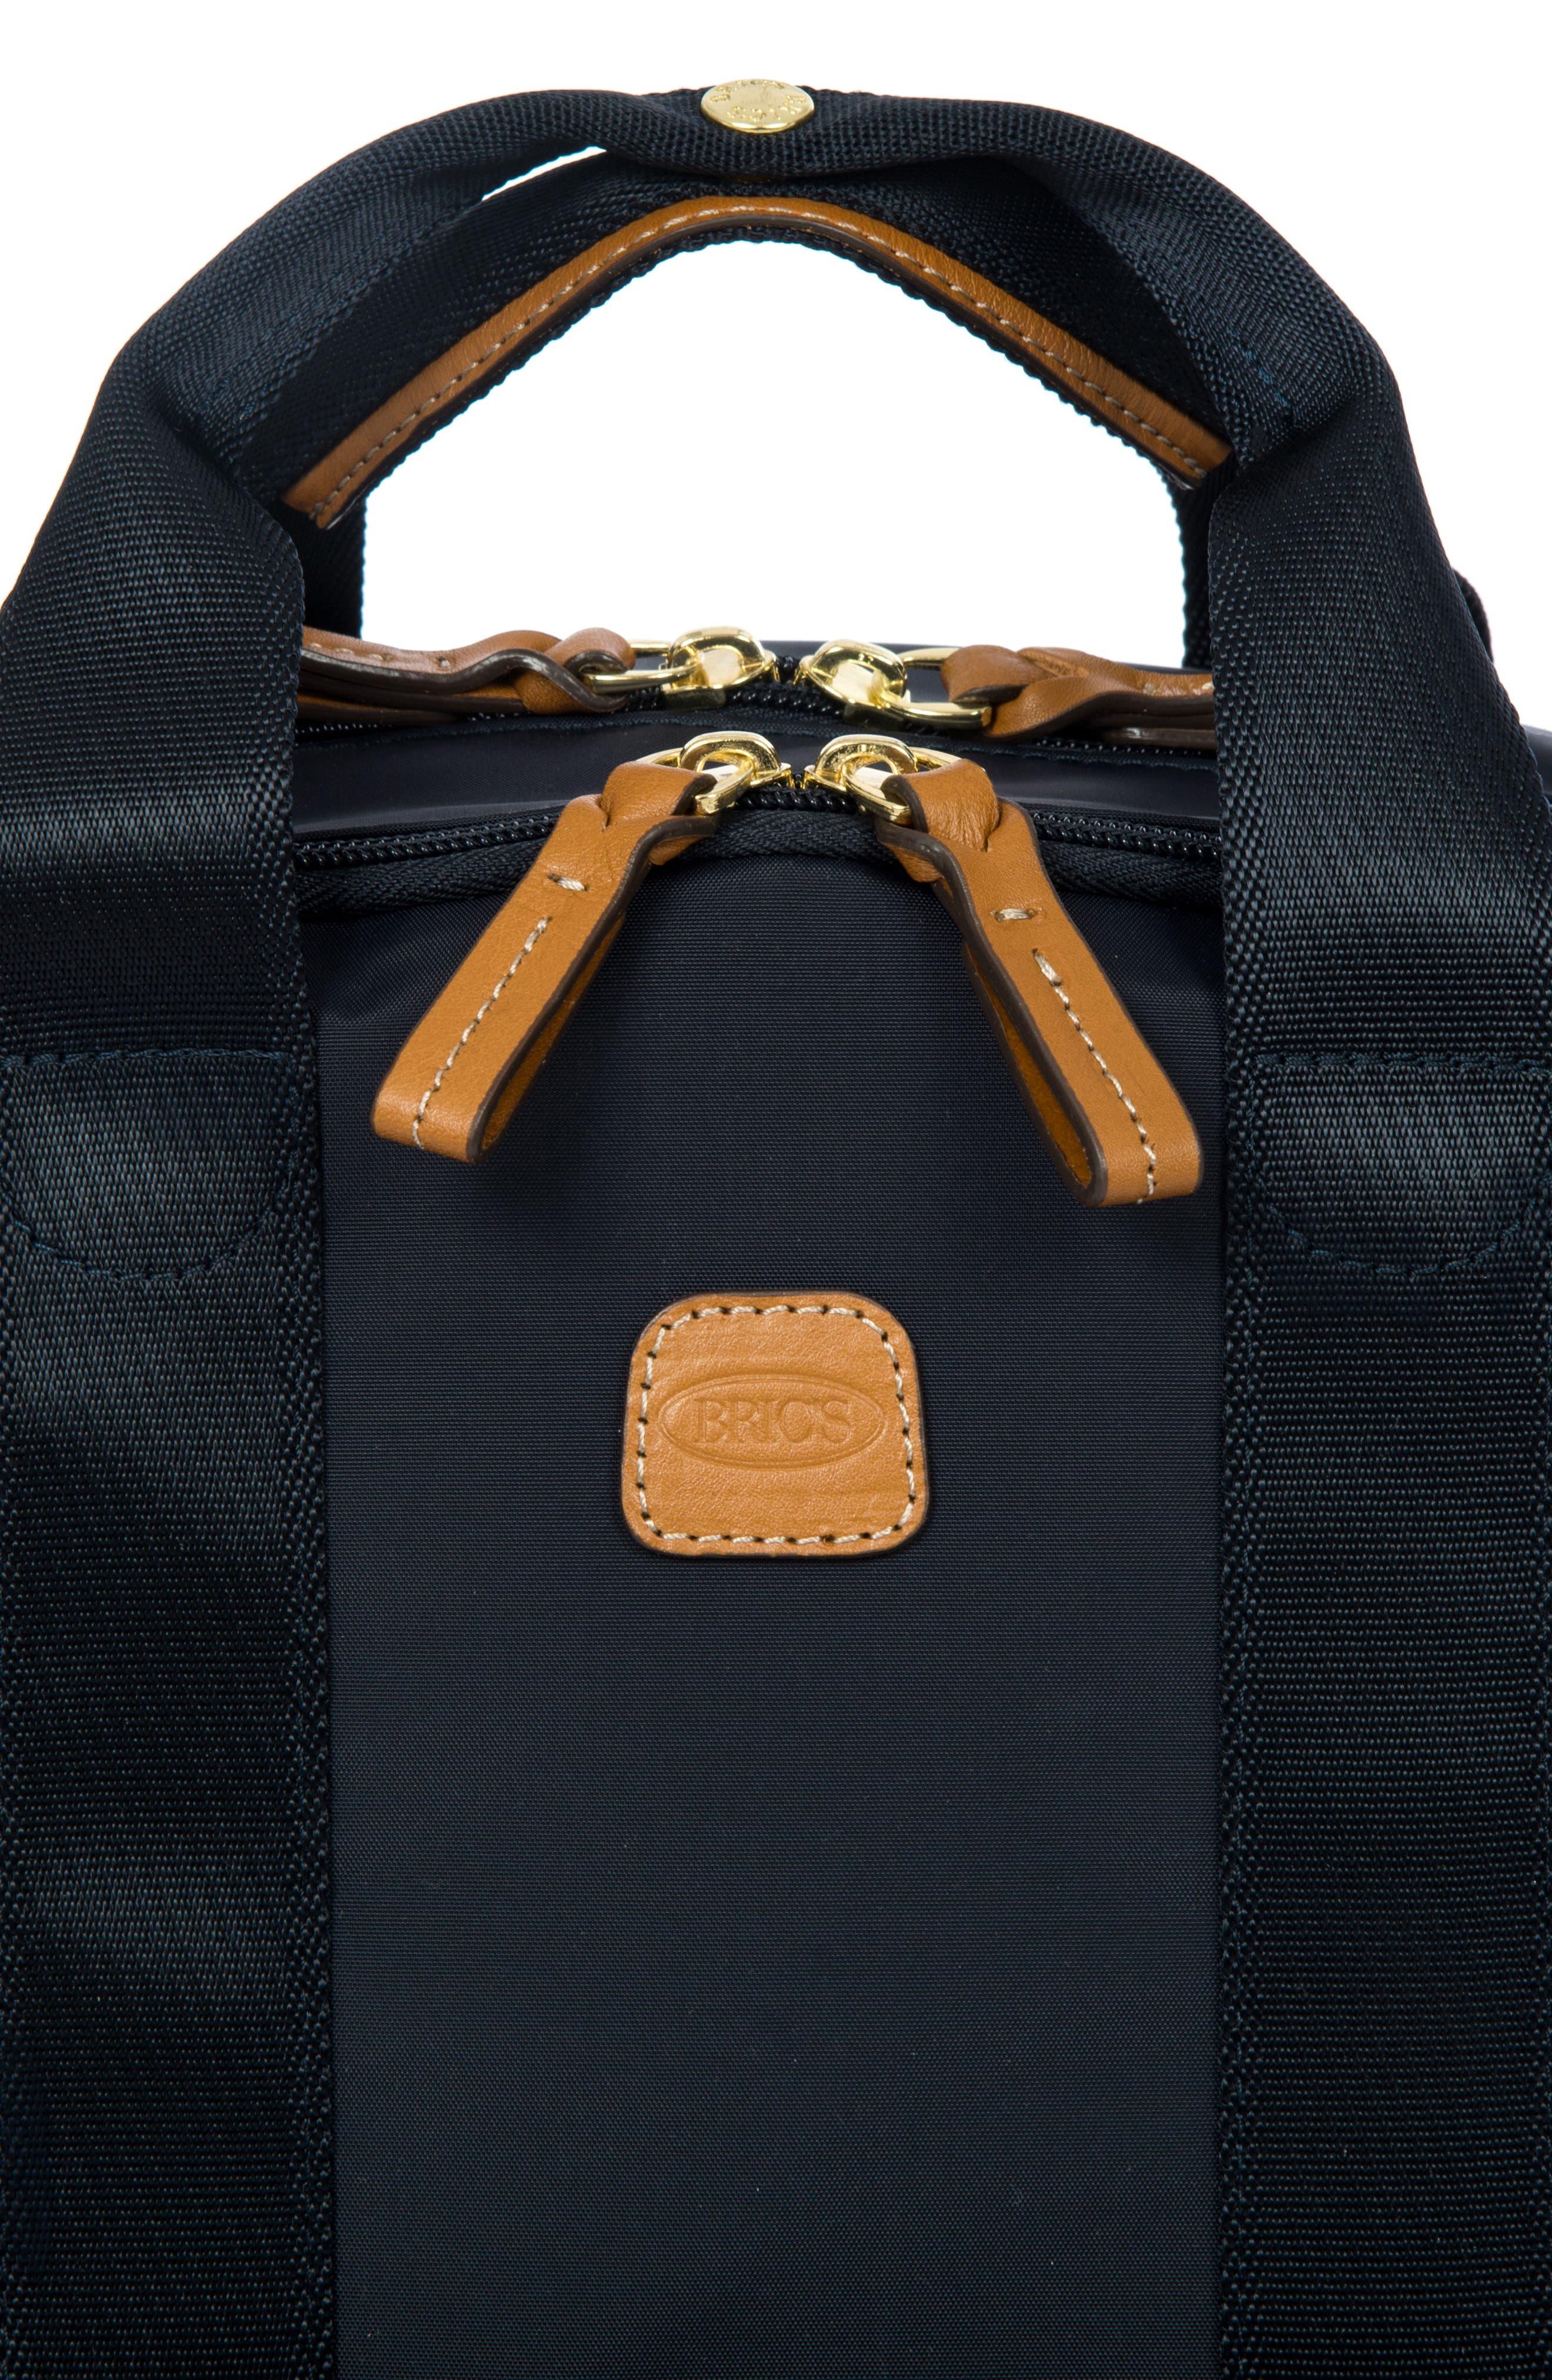 X-Bag Travel Urban Backpack,                             Alternate thumbnail 5, color,                             Navy